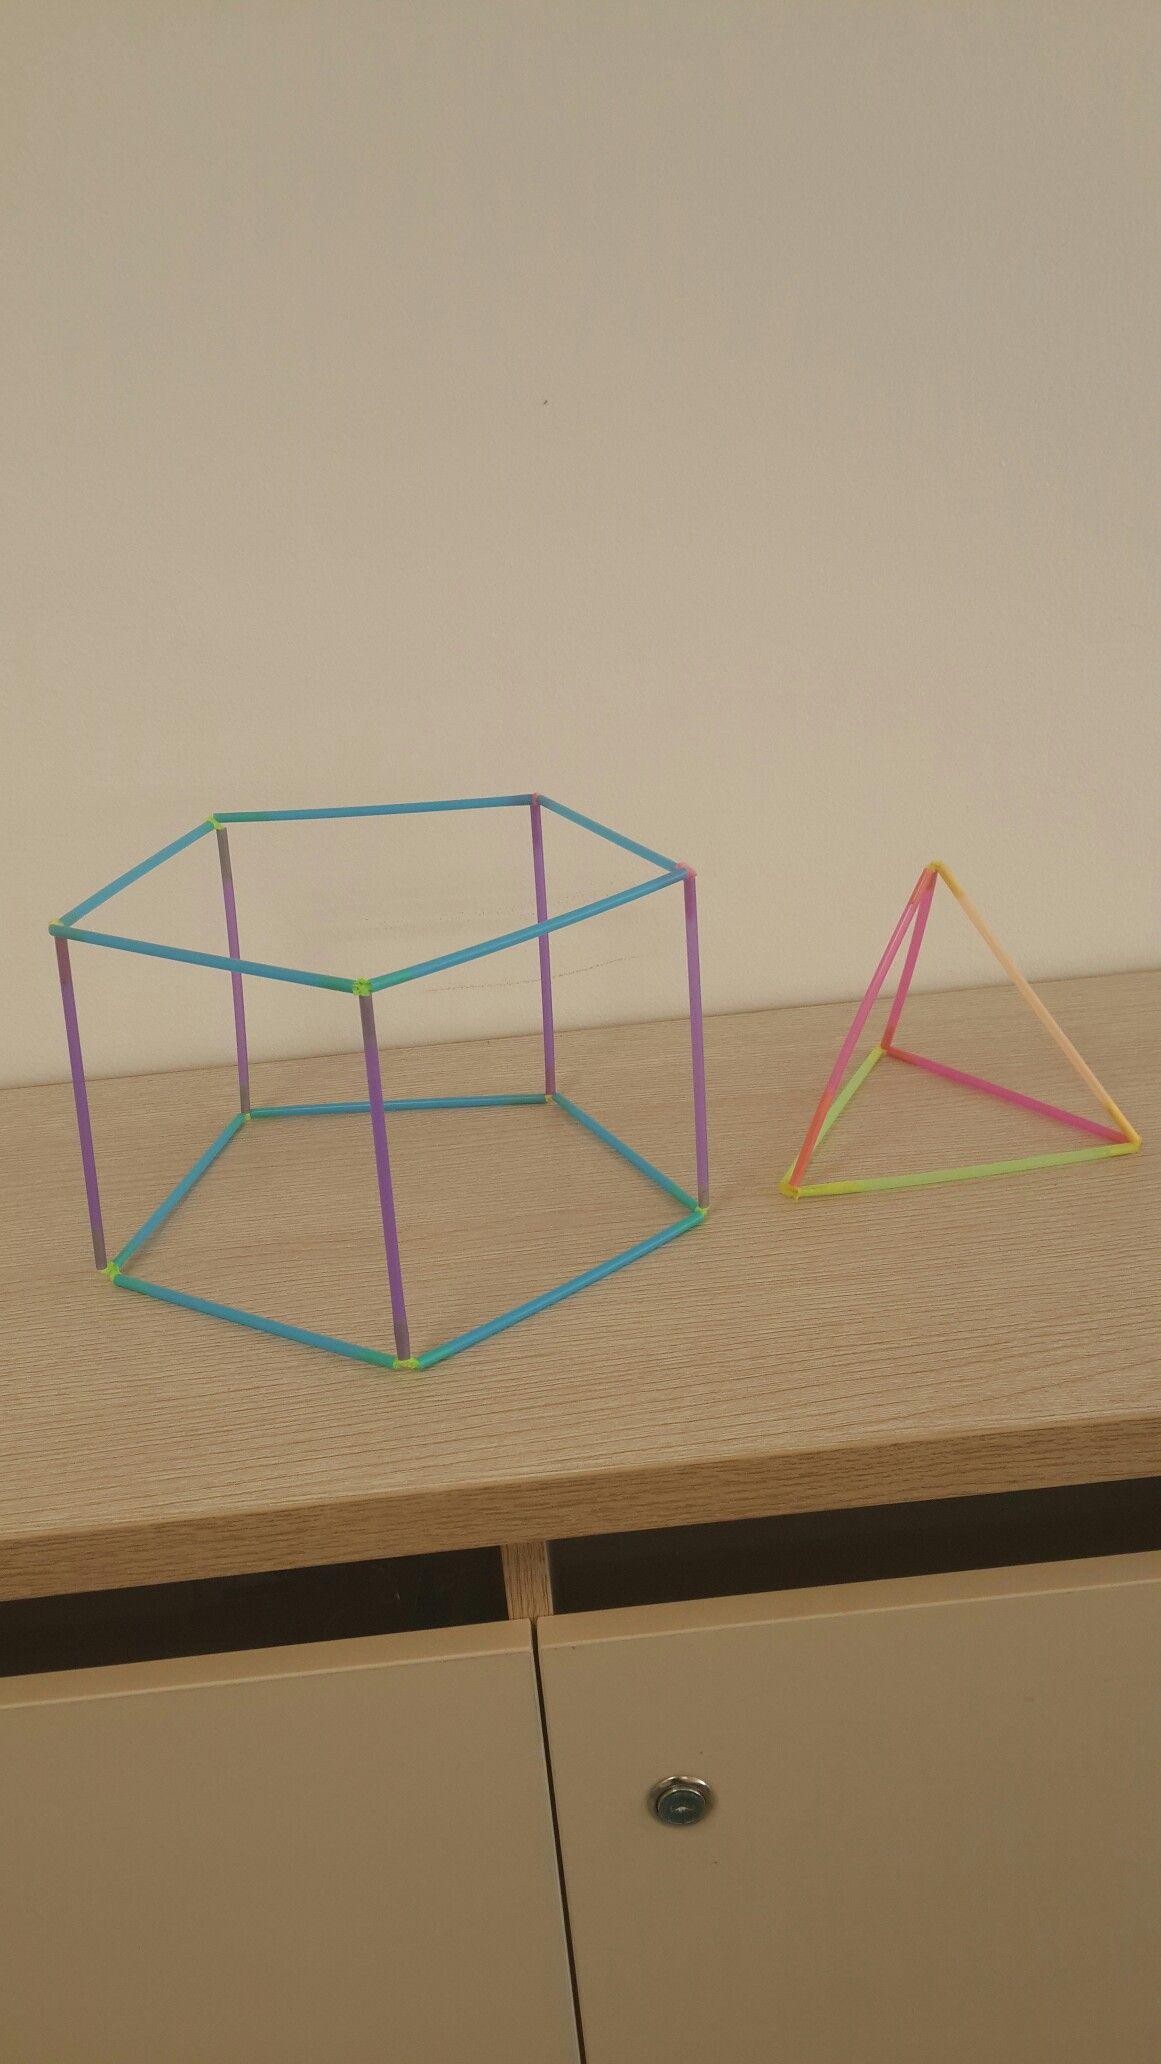 Pin by Rinat baor רינת באור on Geometric entities גופים